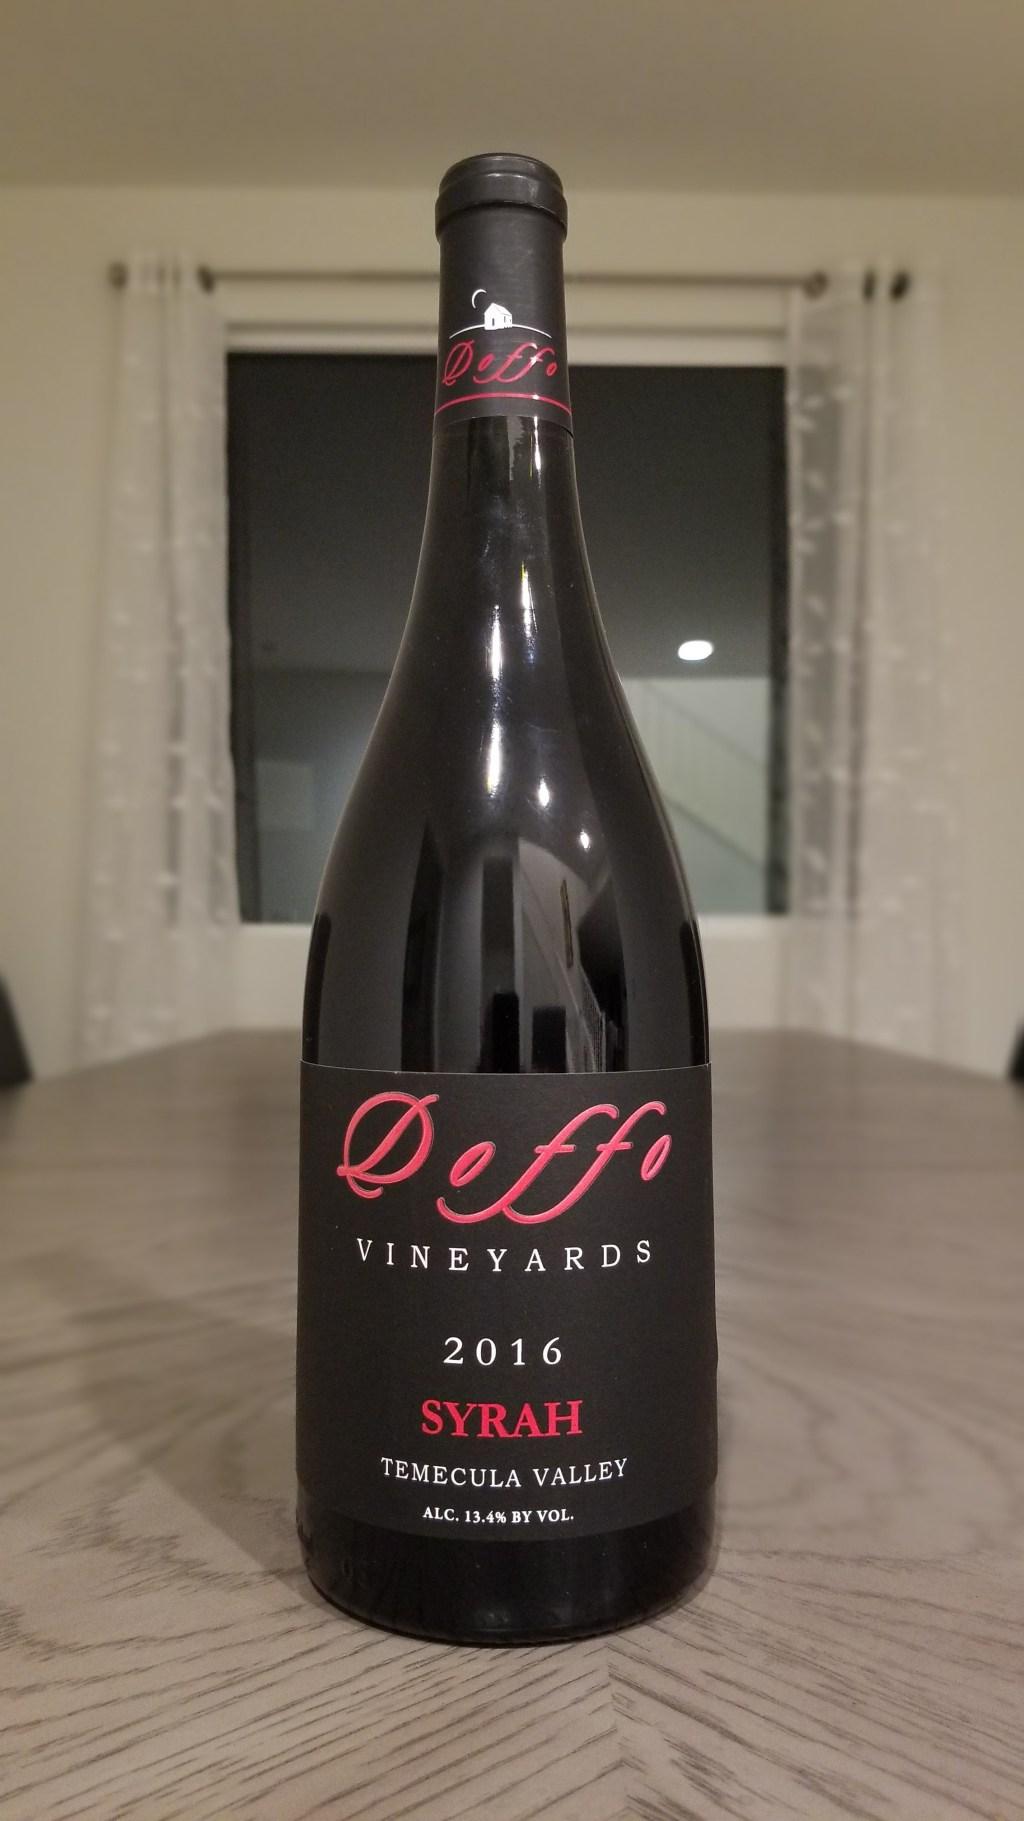 Doffo 2016 Syrah